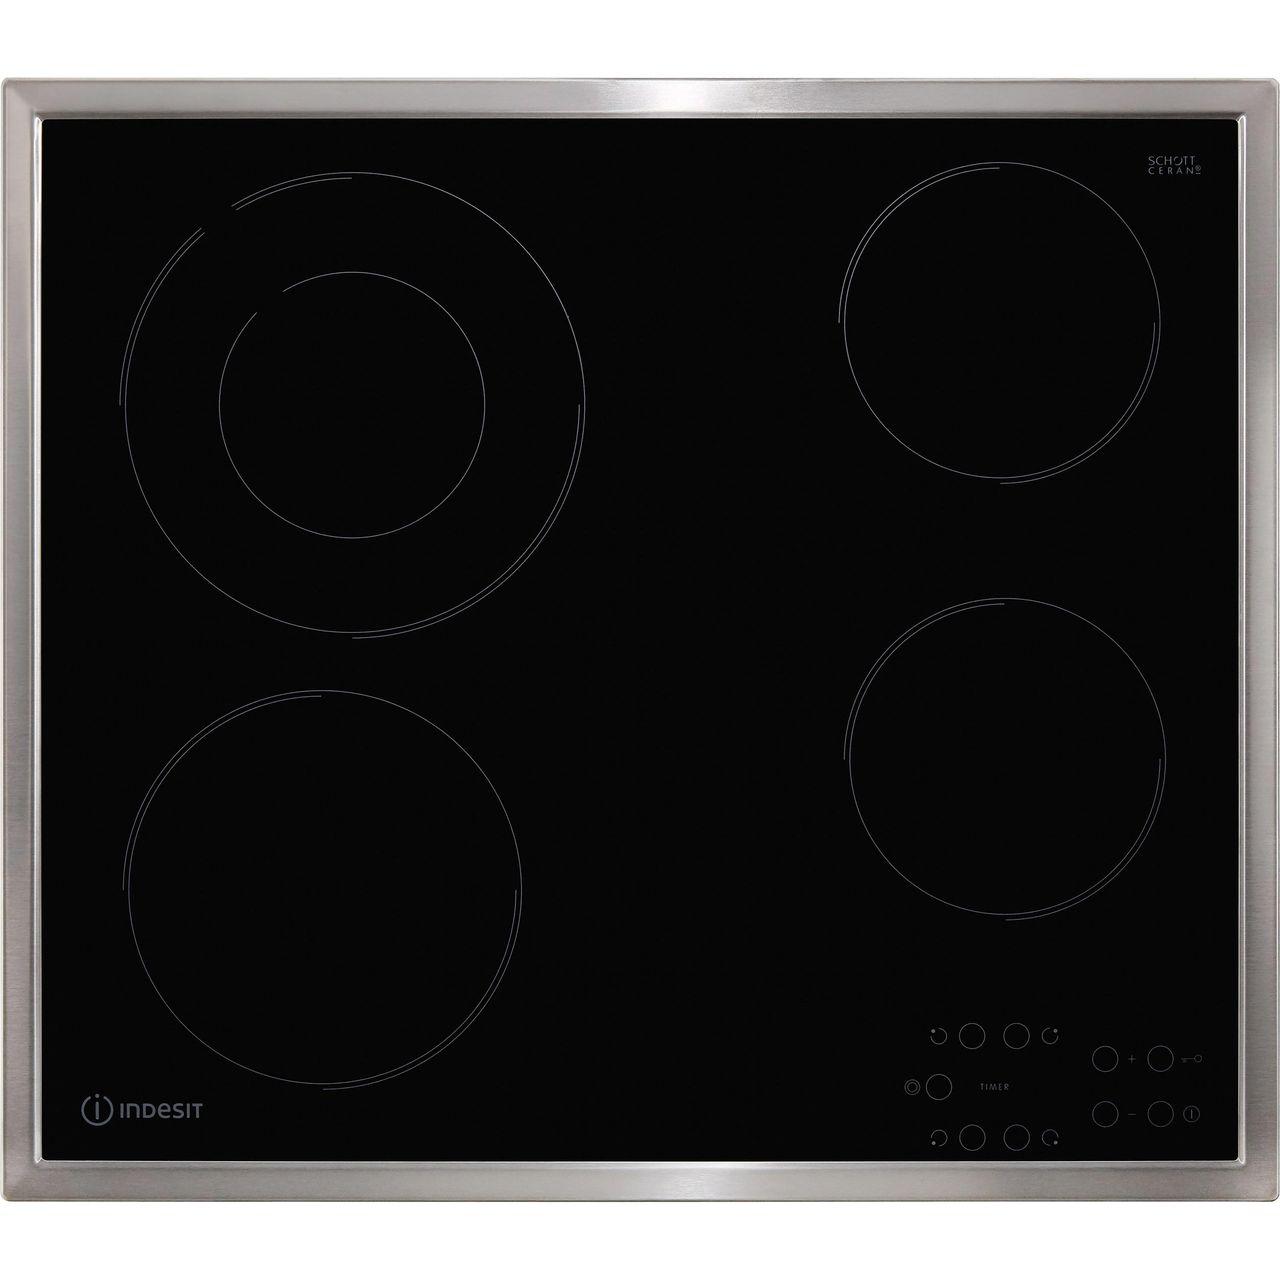 Indesit Ri261x 58cm 4 Burners Ceramic Hob Touch Control